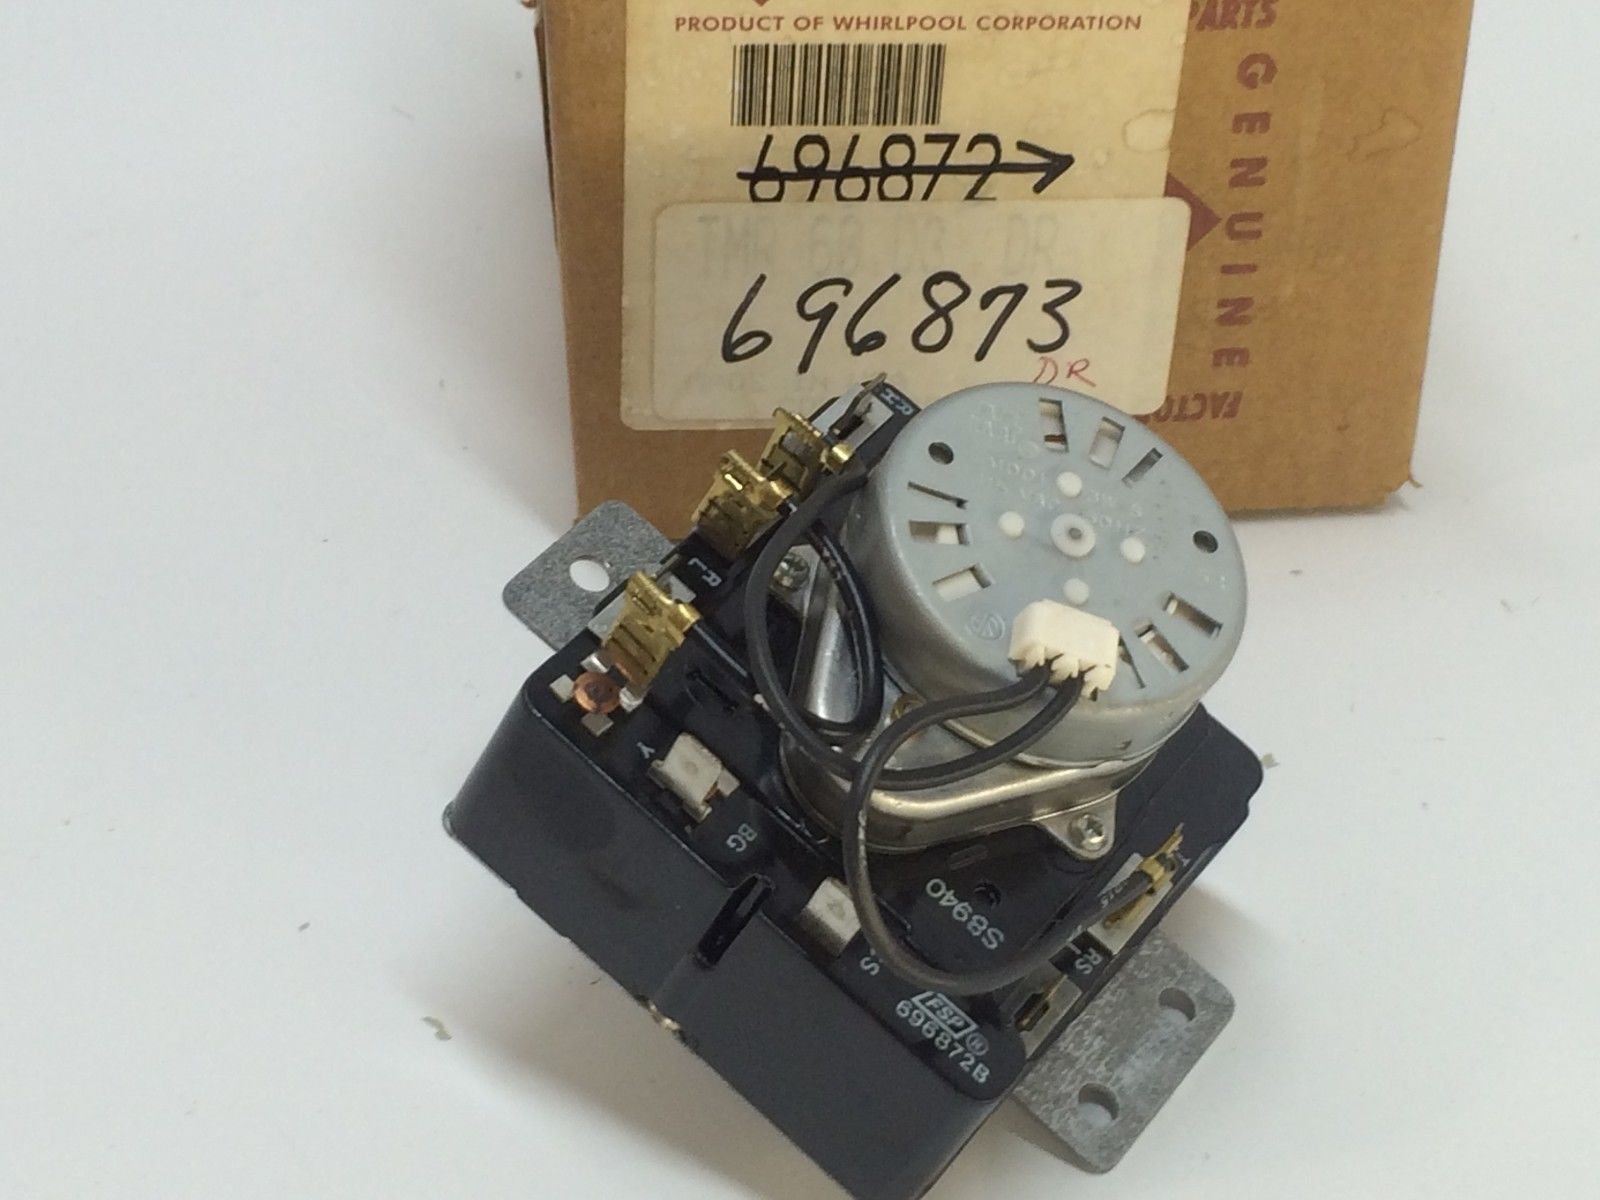 Appliance Repair Parts Appliance Repair Parts 696873